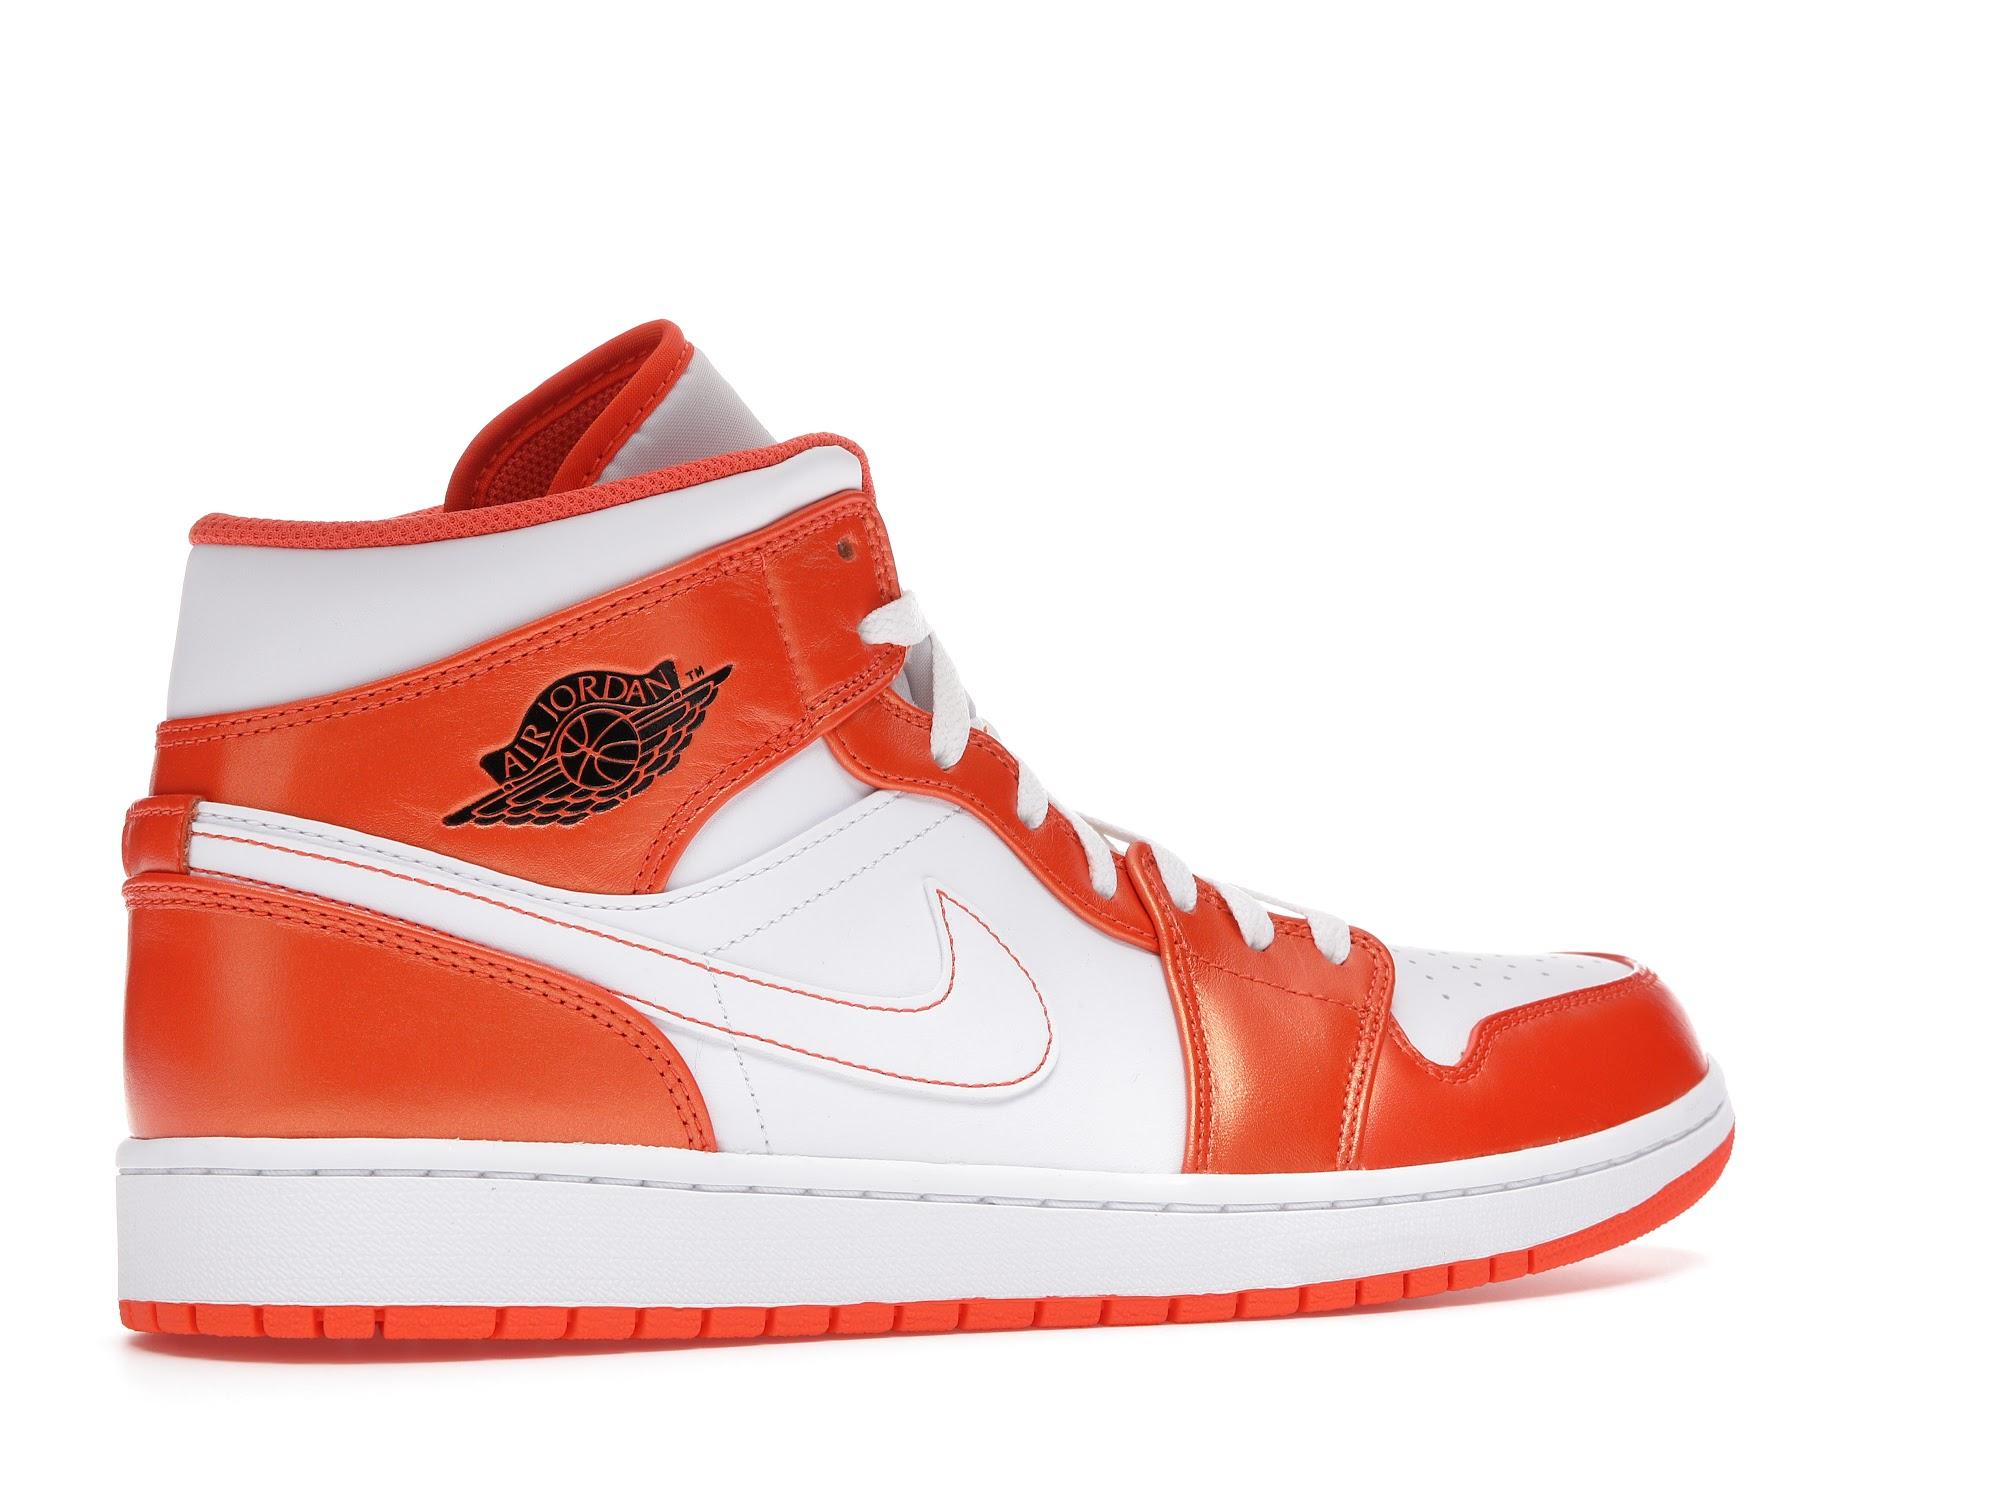 Jordan 1 Mid Metallic Orange